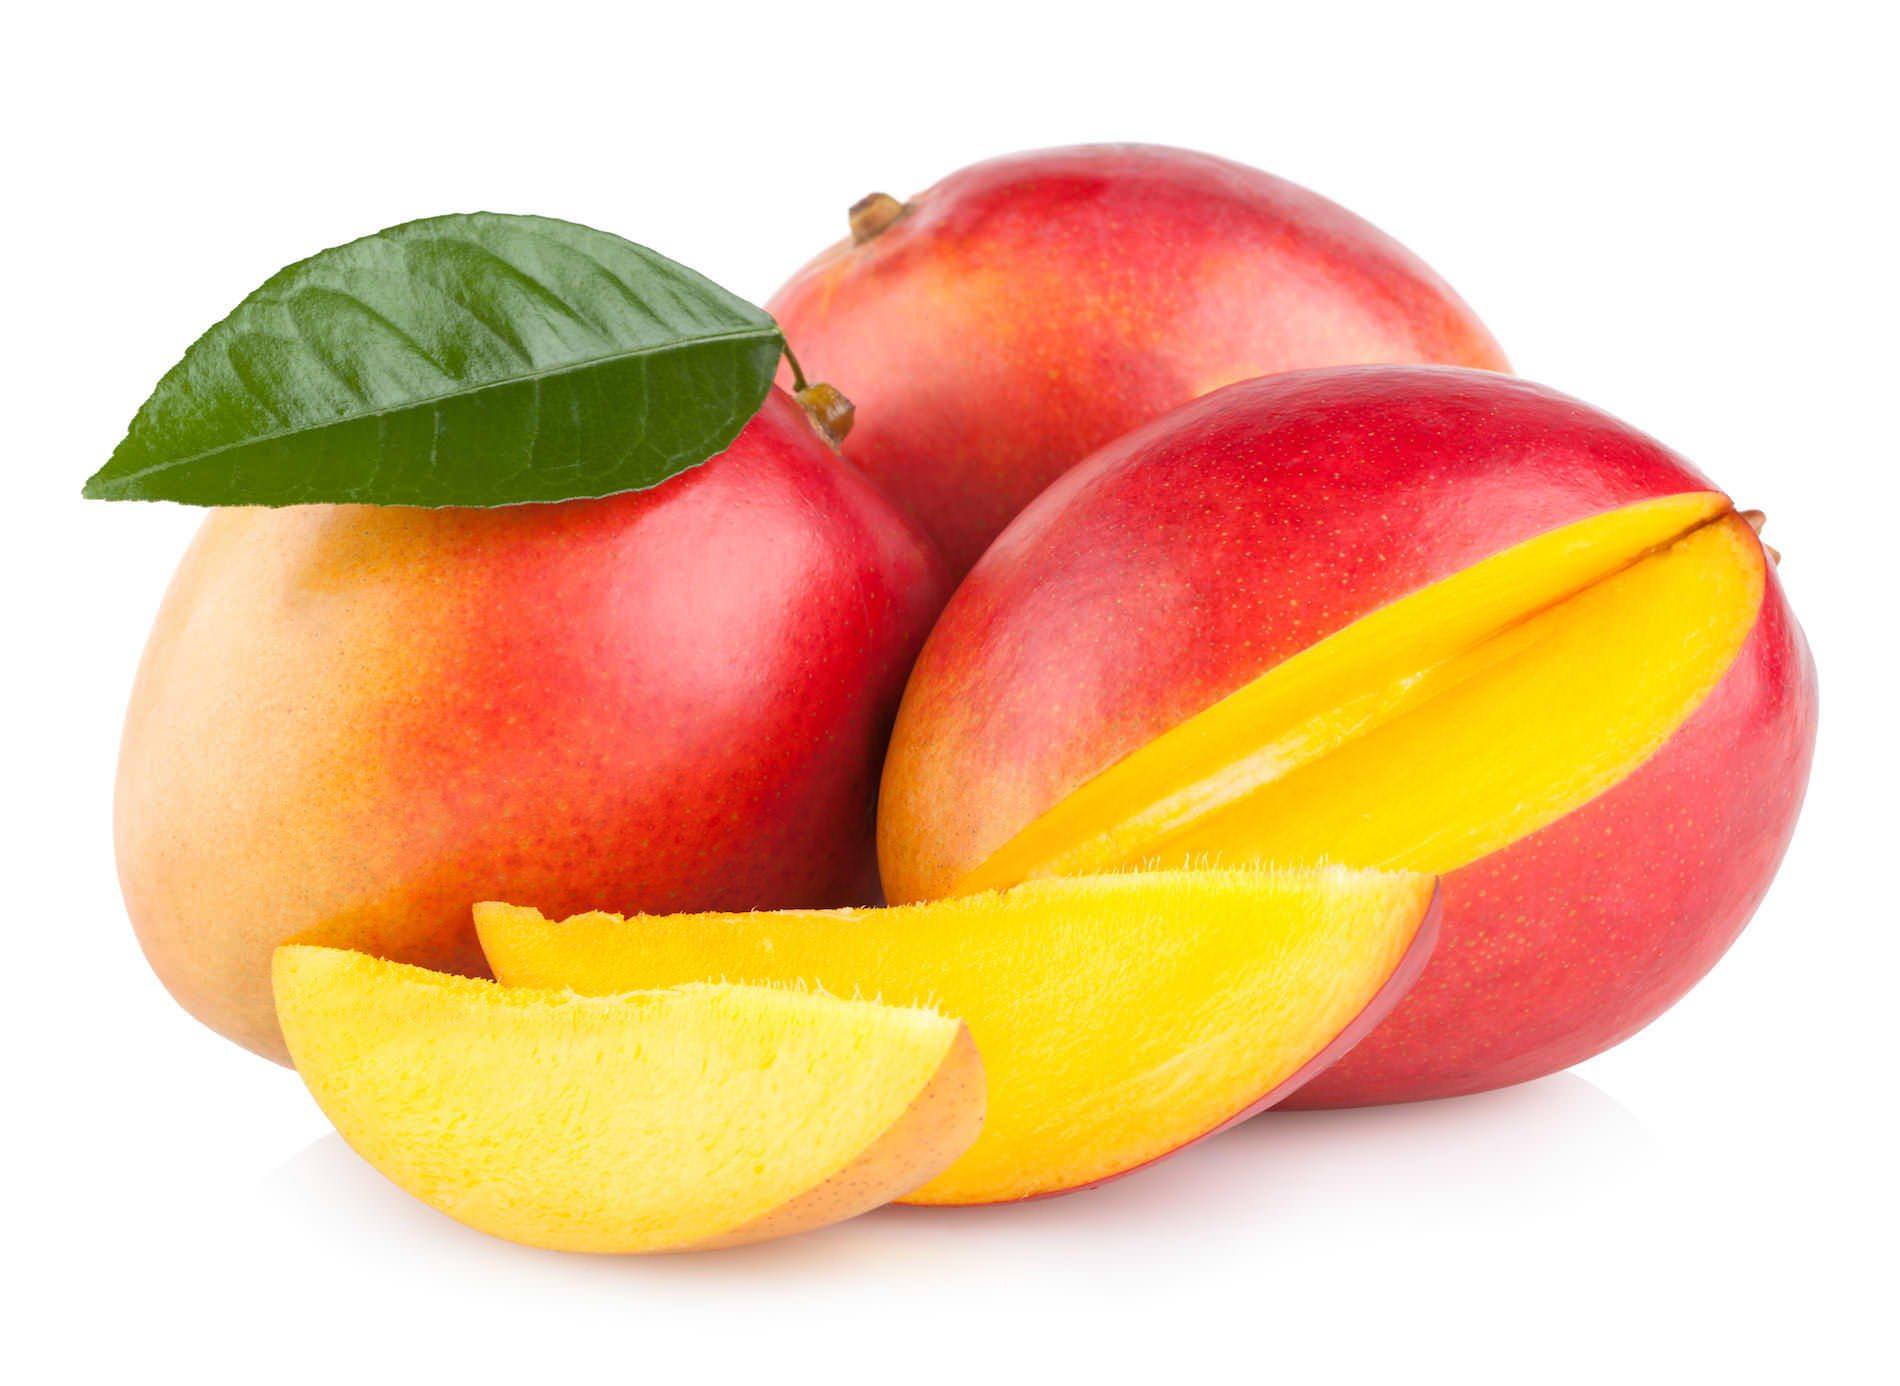 mango from Ghana